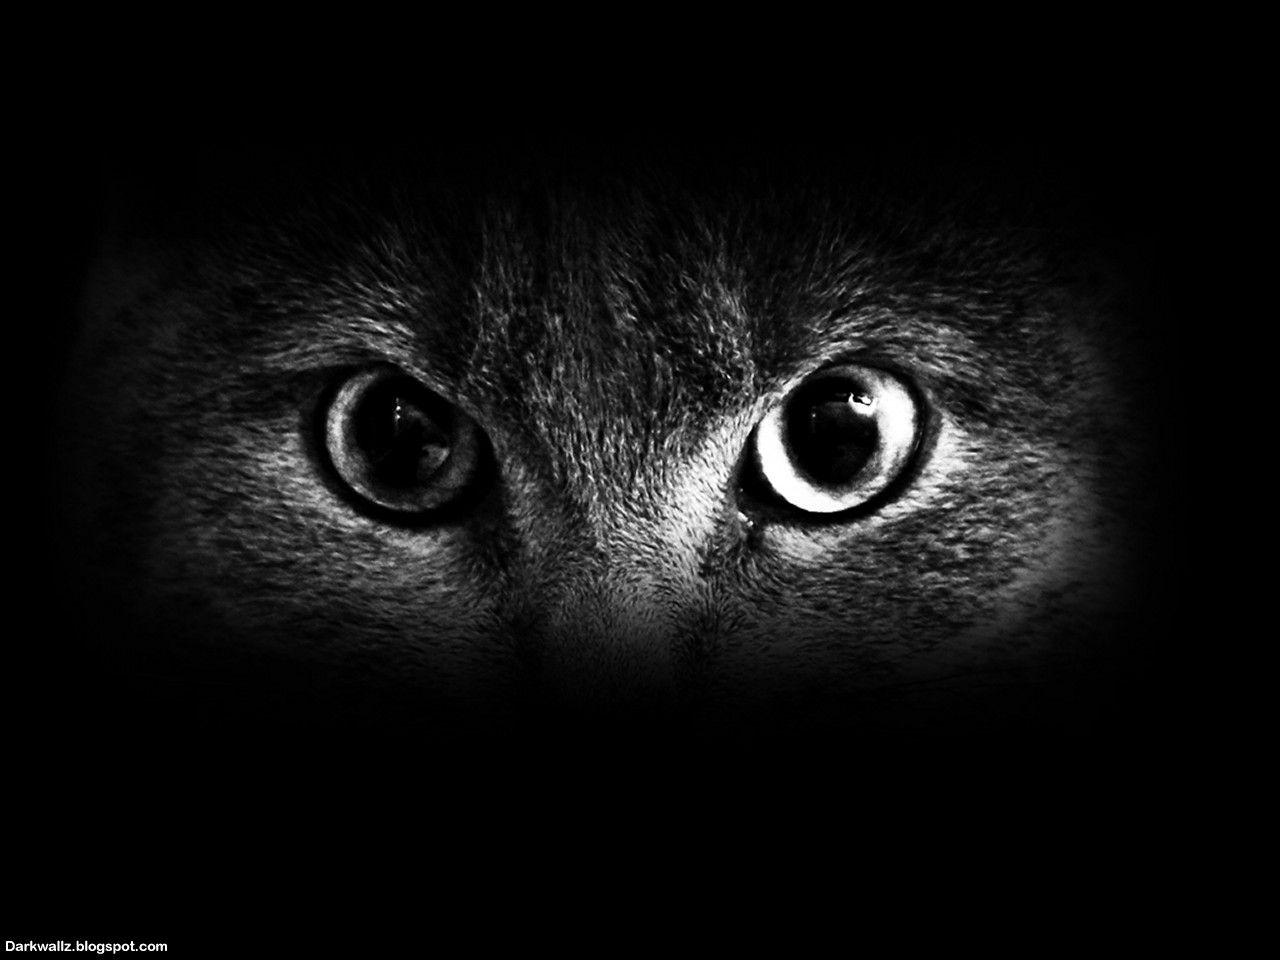 Black Cat Wallpaper Buscar Con Google Cat With Blue Eyes Cat Aesthetic Black Cat Aesthetic